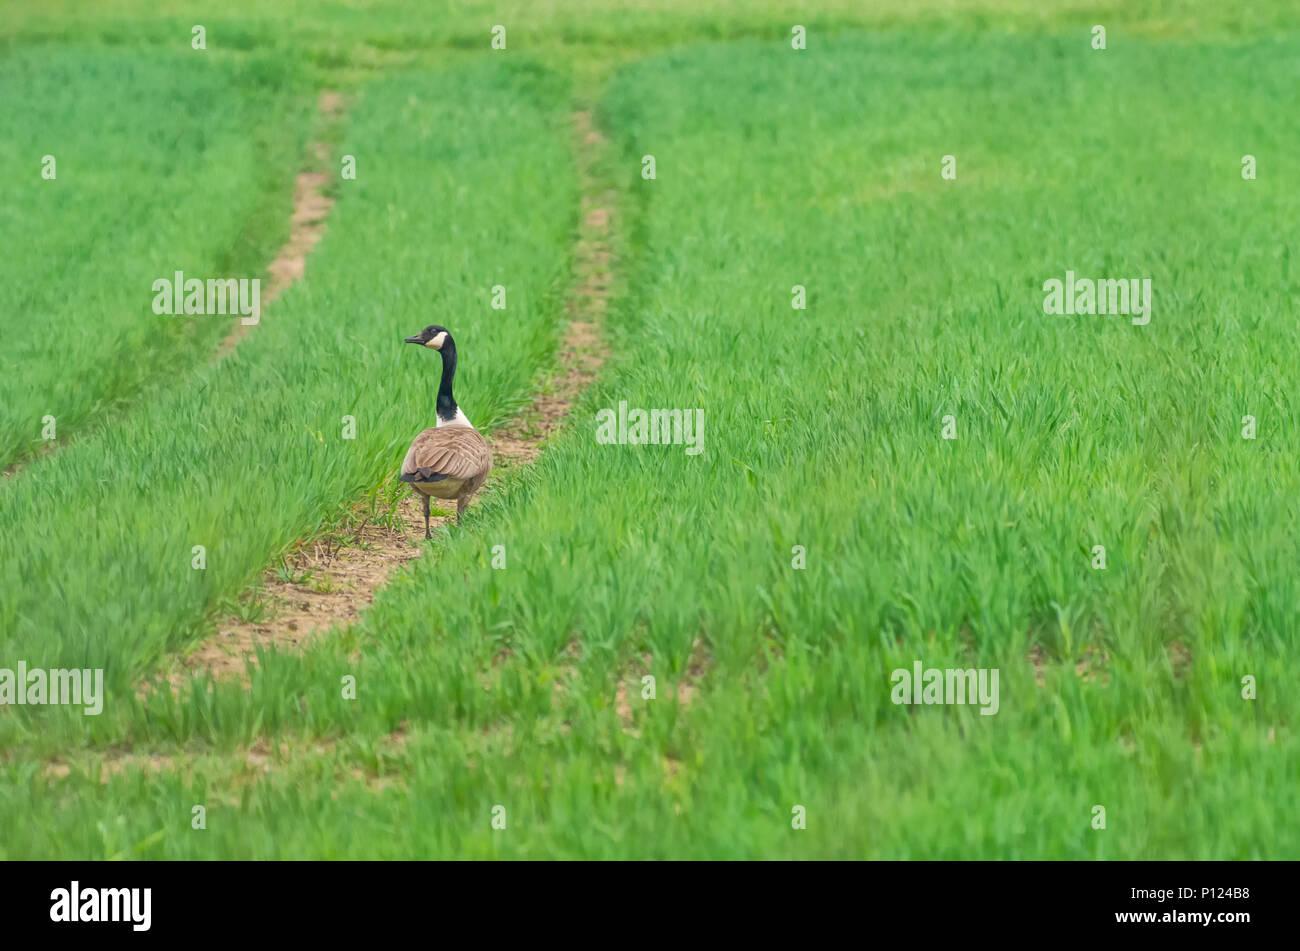 Kanada Gans Im Grünen Bereich Stockfoto Bild 207186428 Alamy